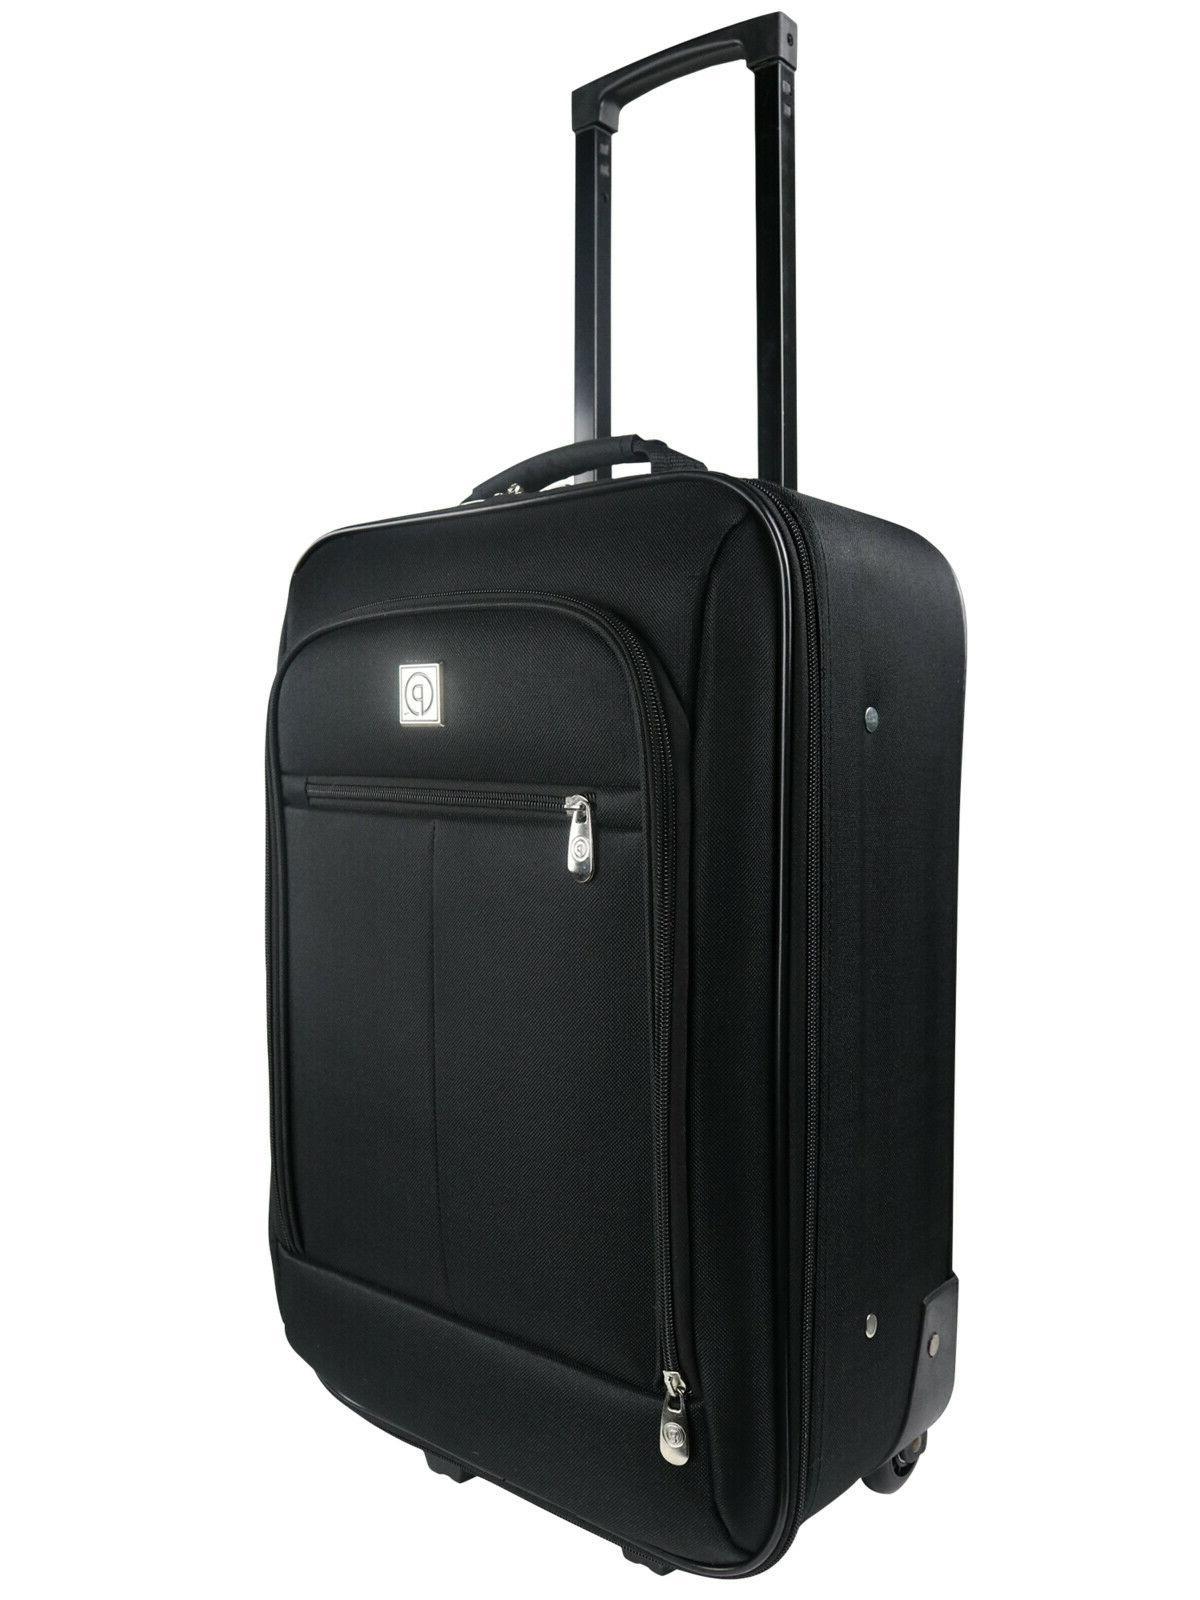 Upright Handle Bag